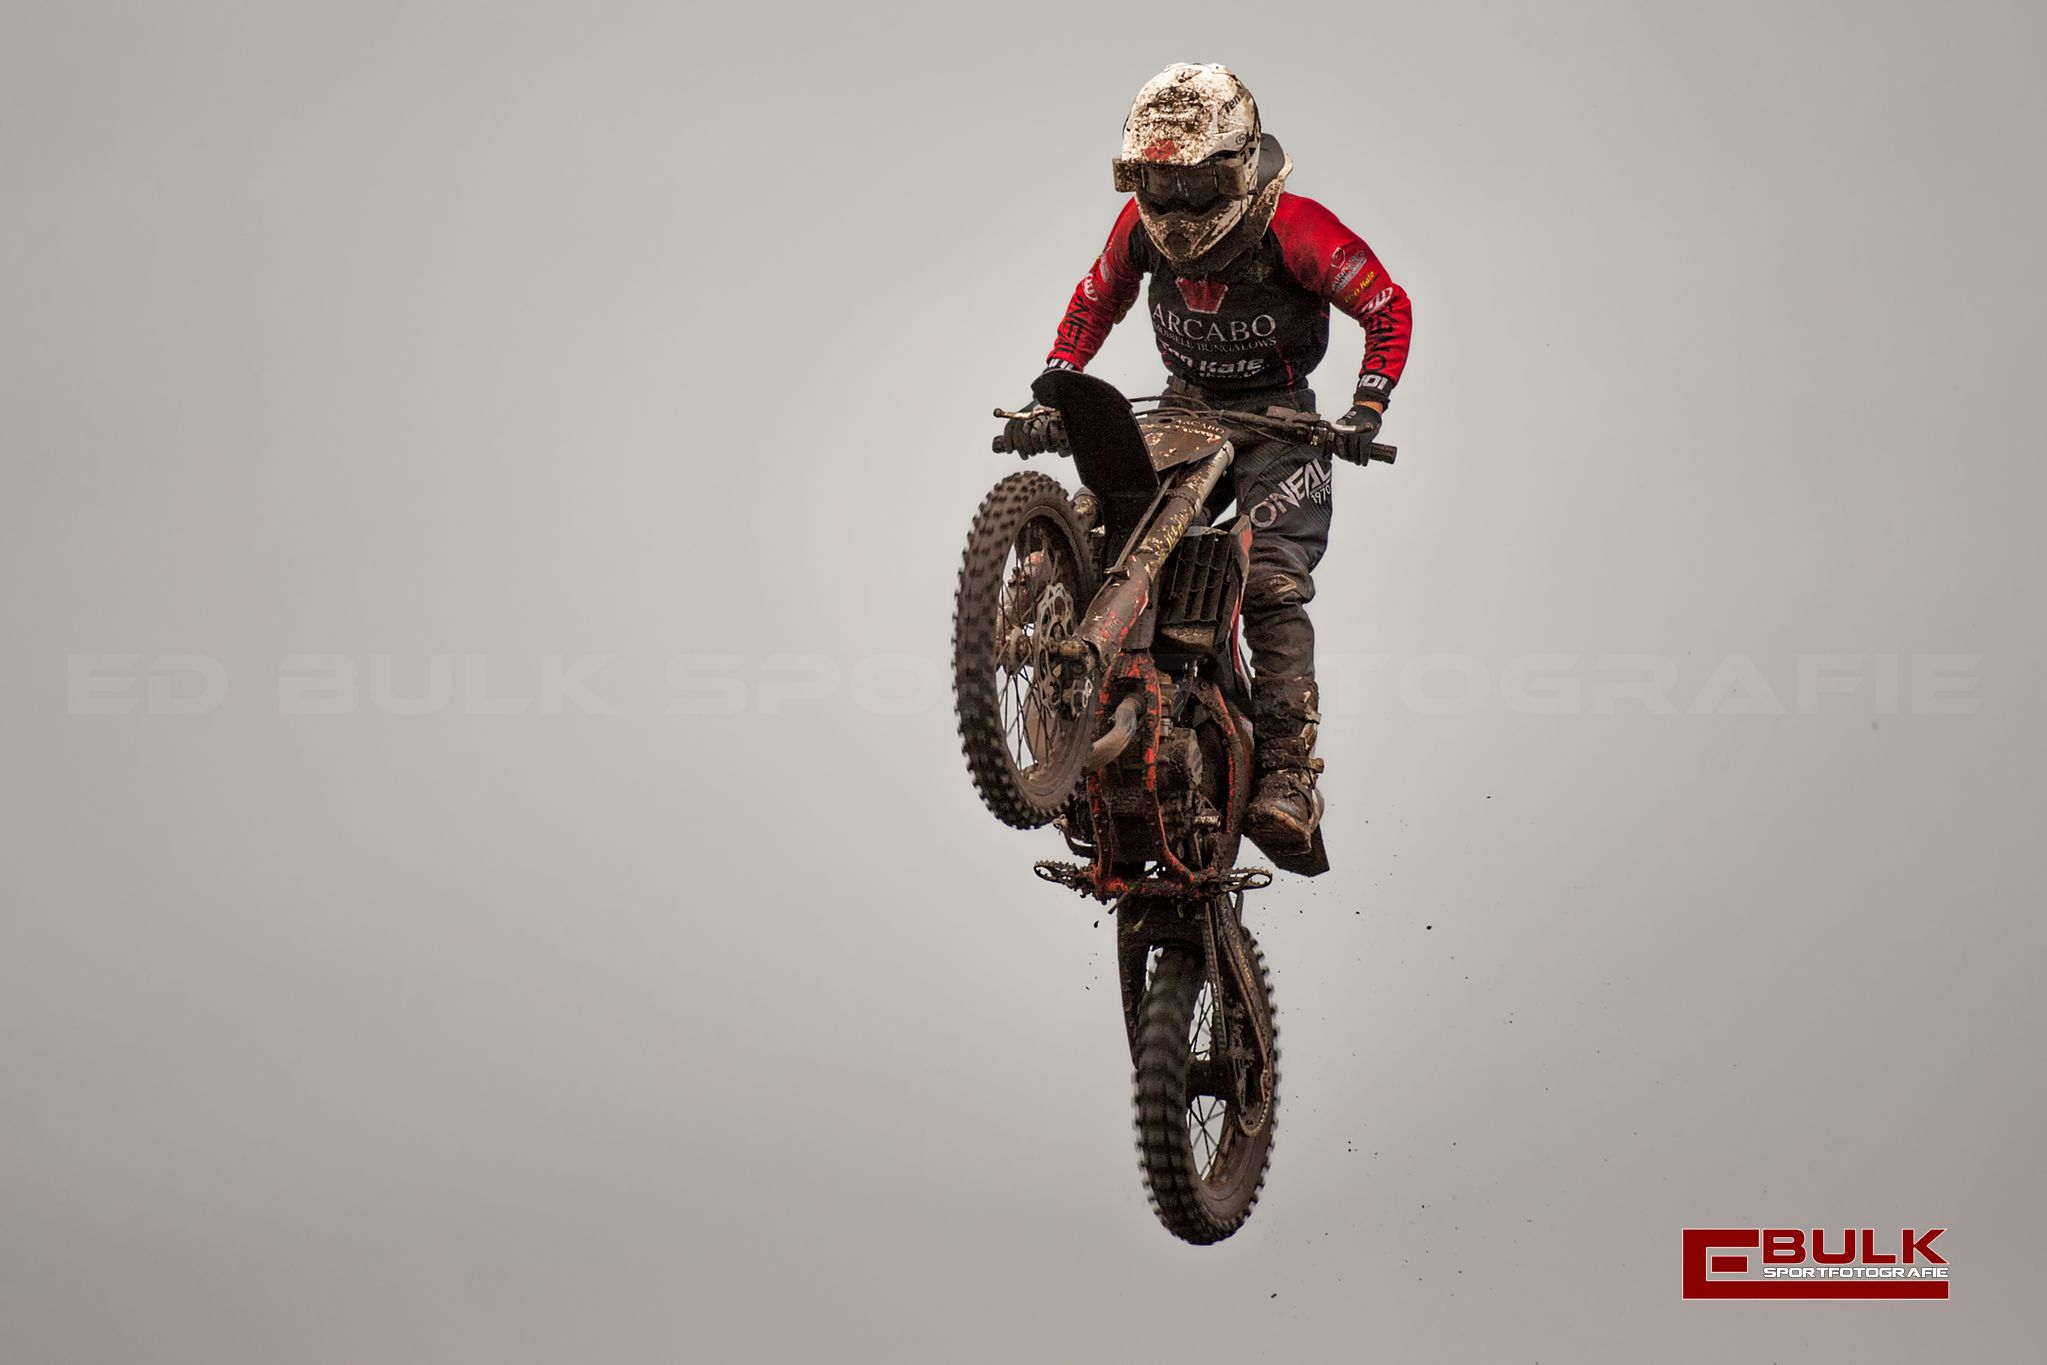 ebs_1332-ed_bulk_sportfotografie